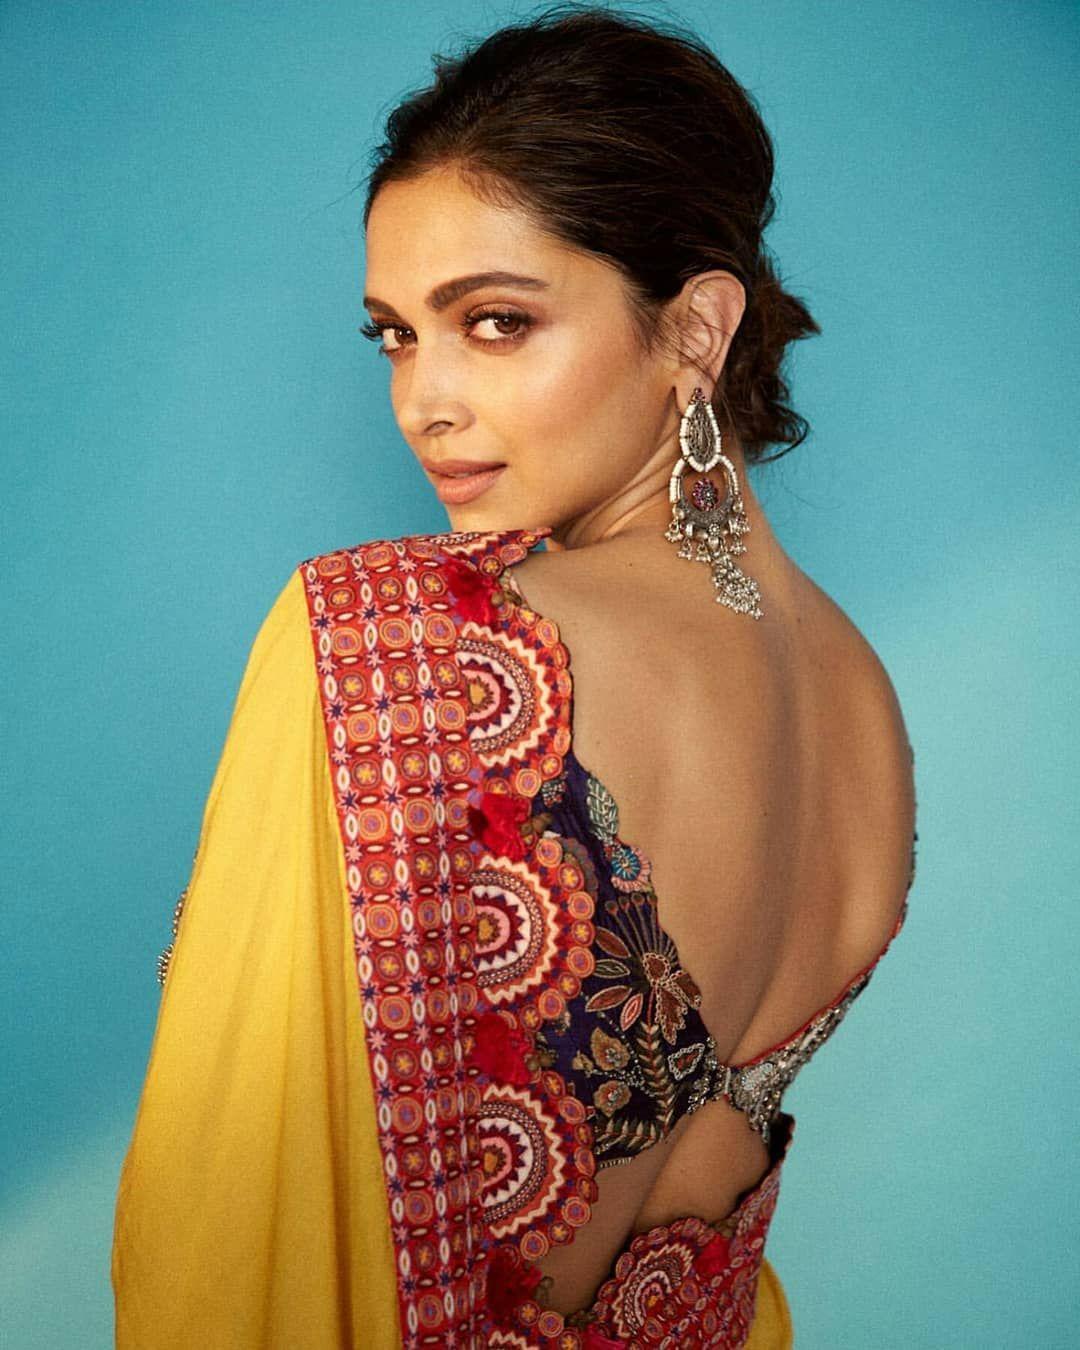 Deepika Padukone Picks Up A Pretty Saree For The ...